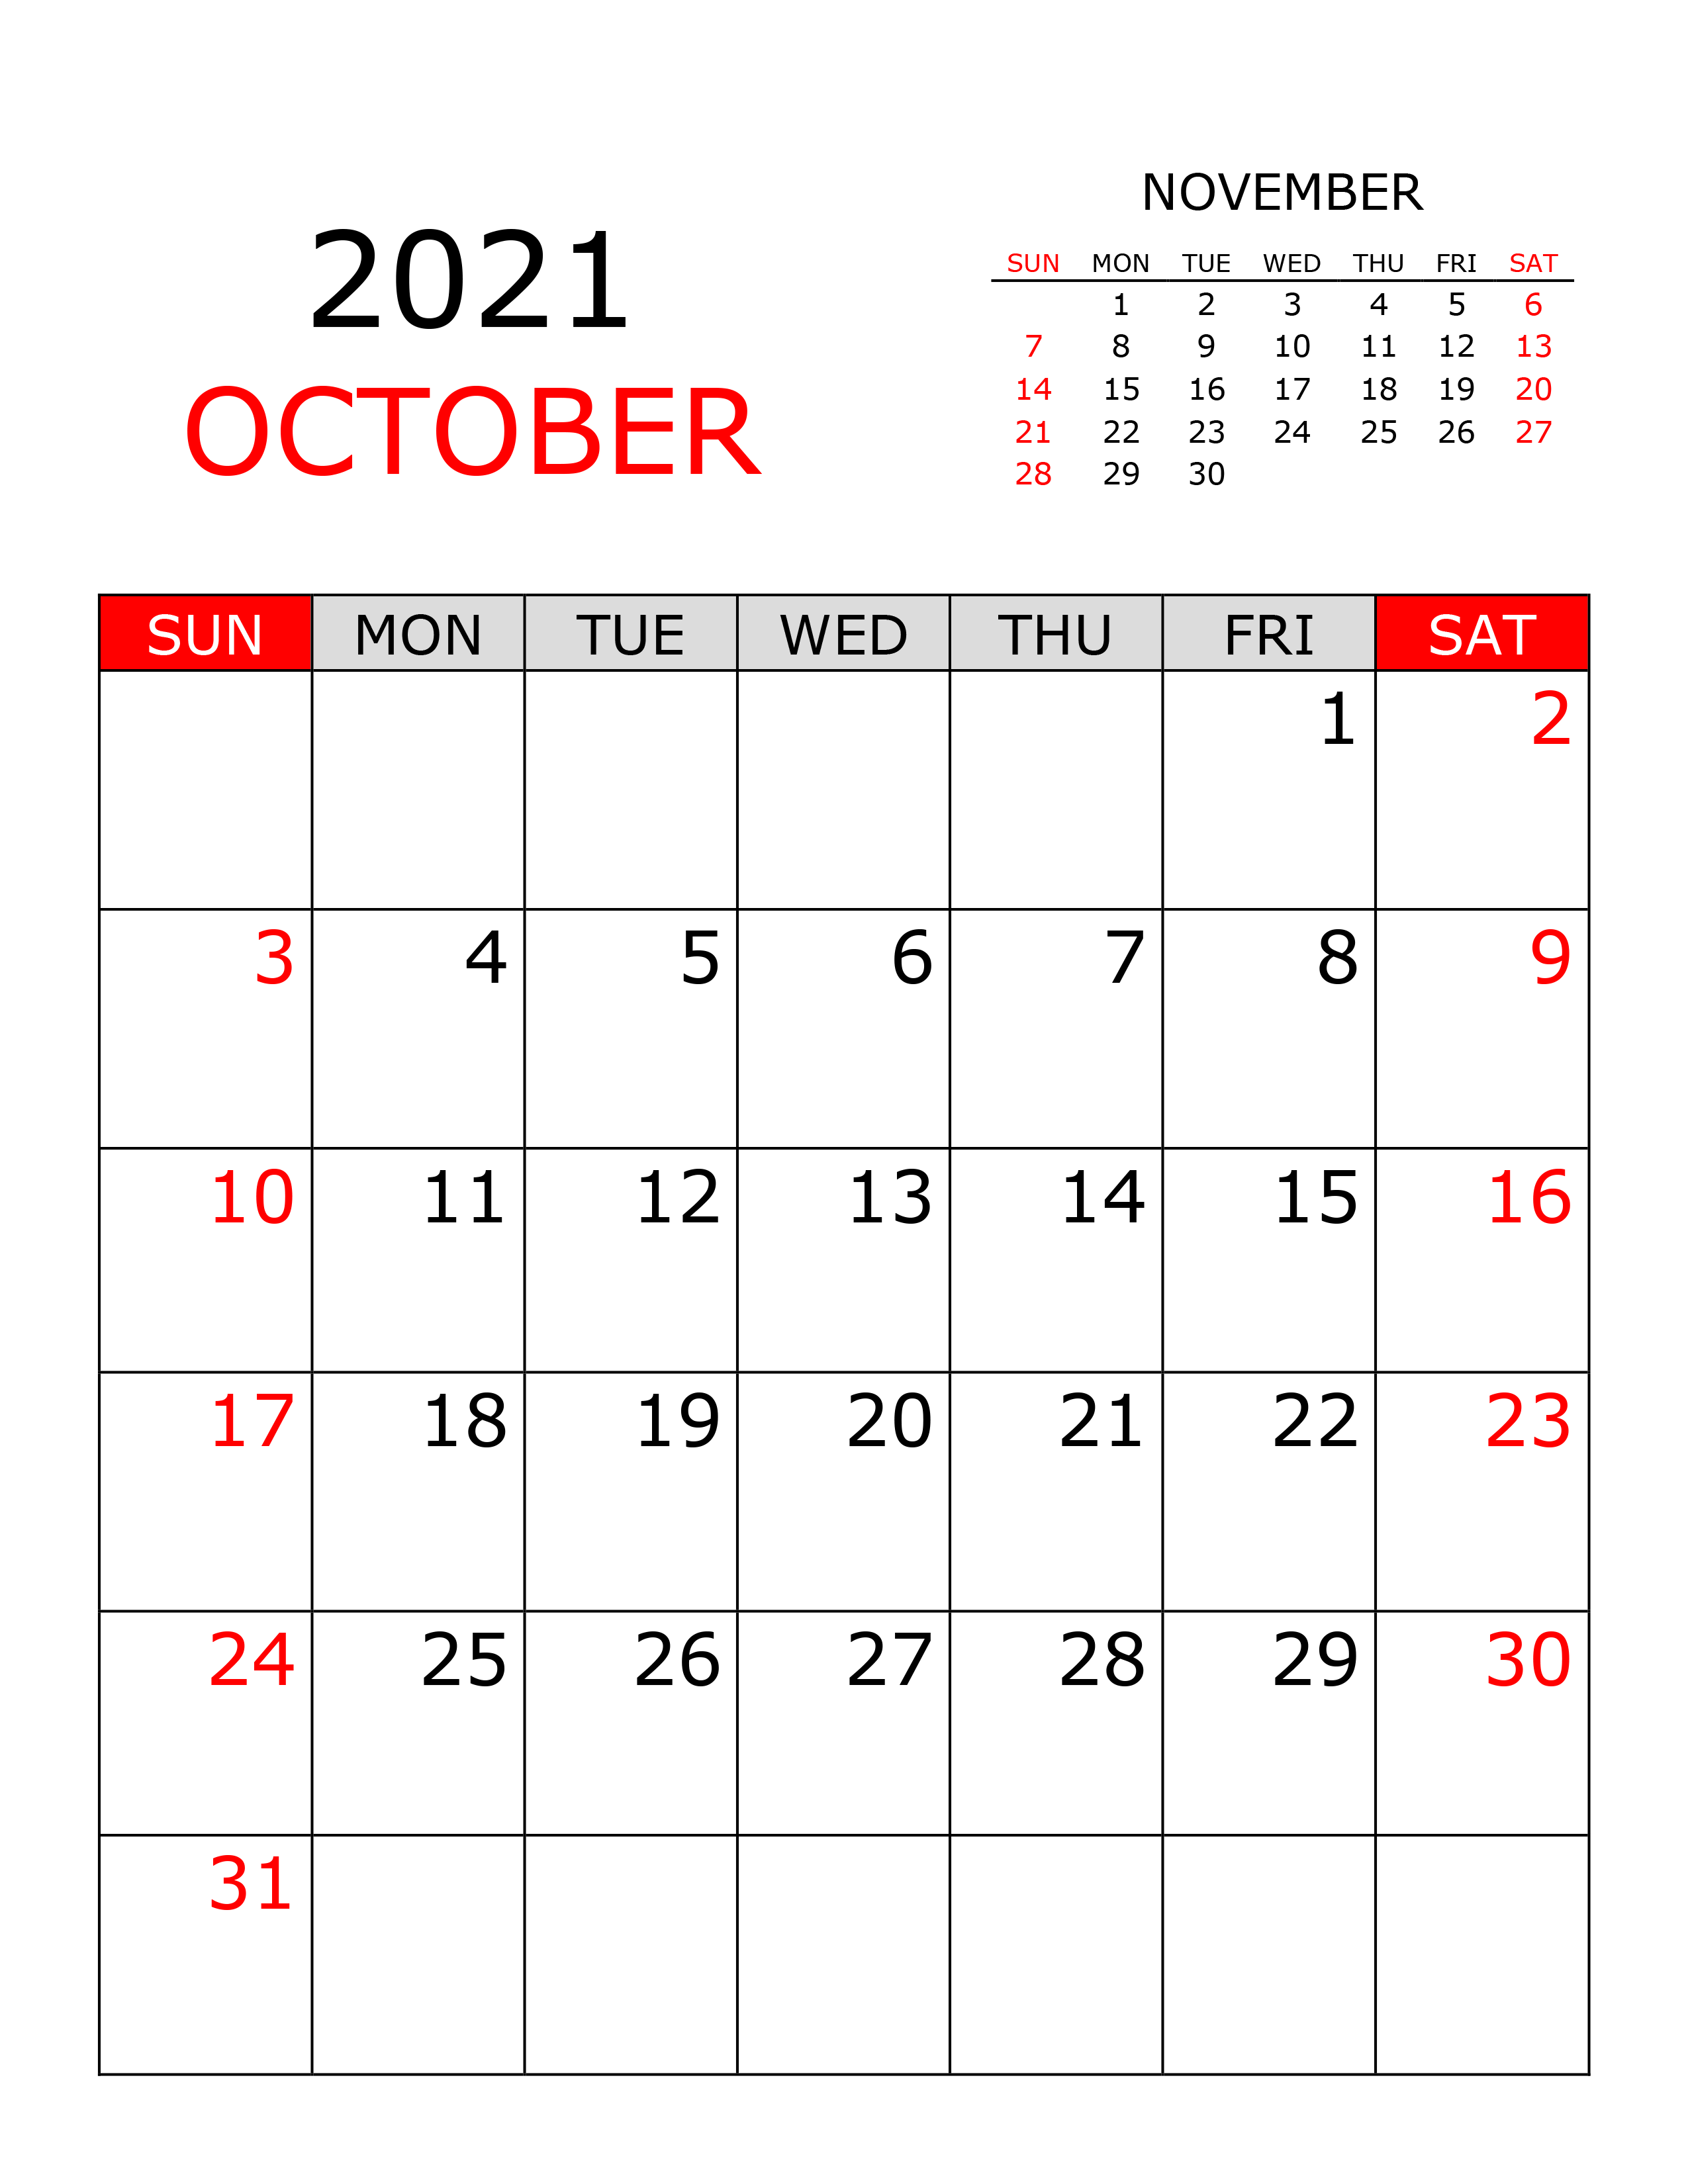 Calendar for October 2021 - free-calendar.su